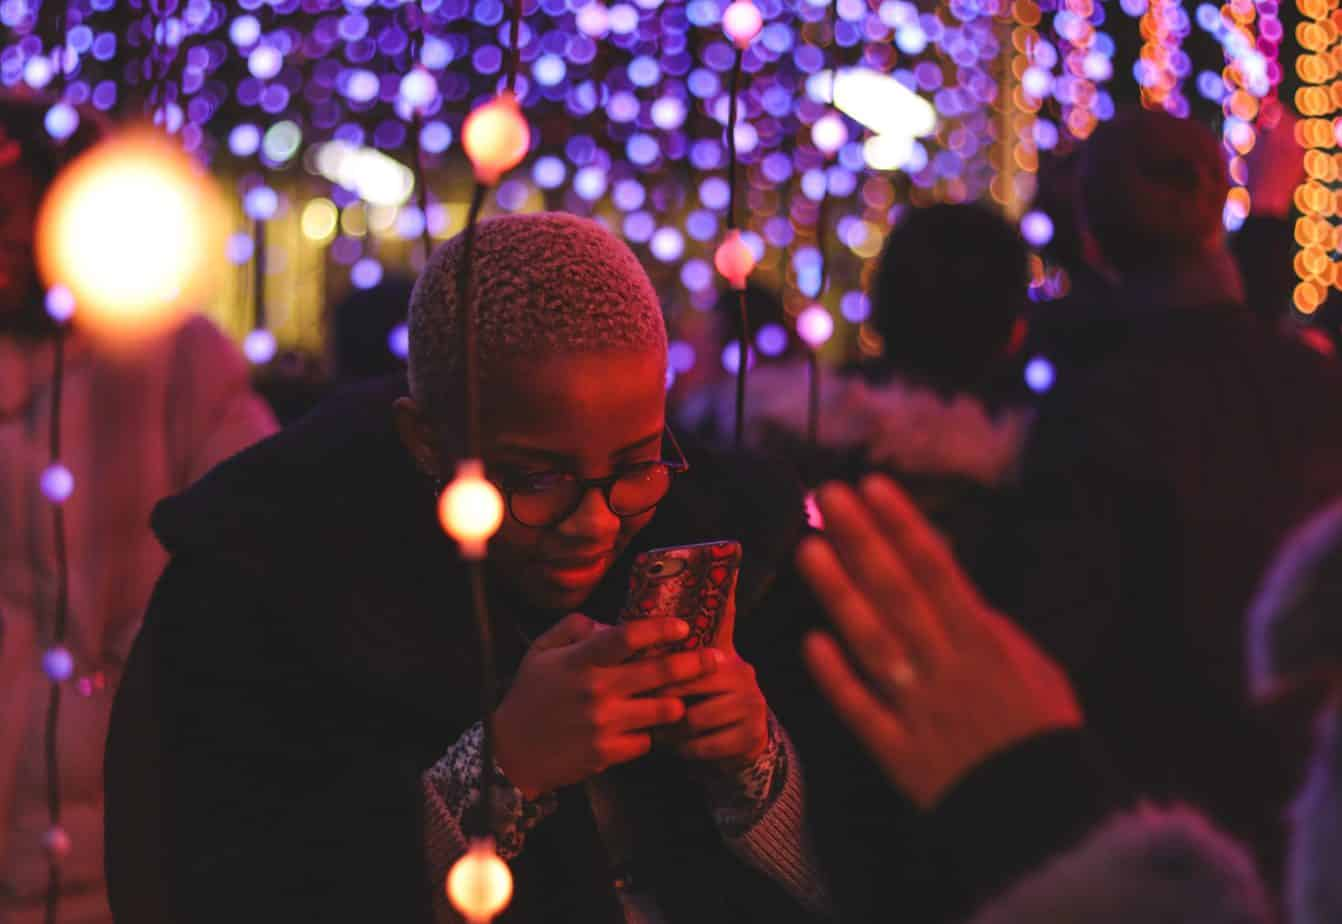 Woman engaging in social media